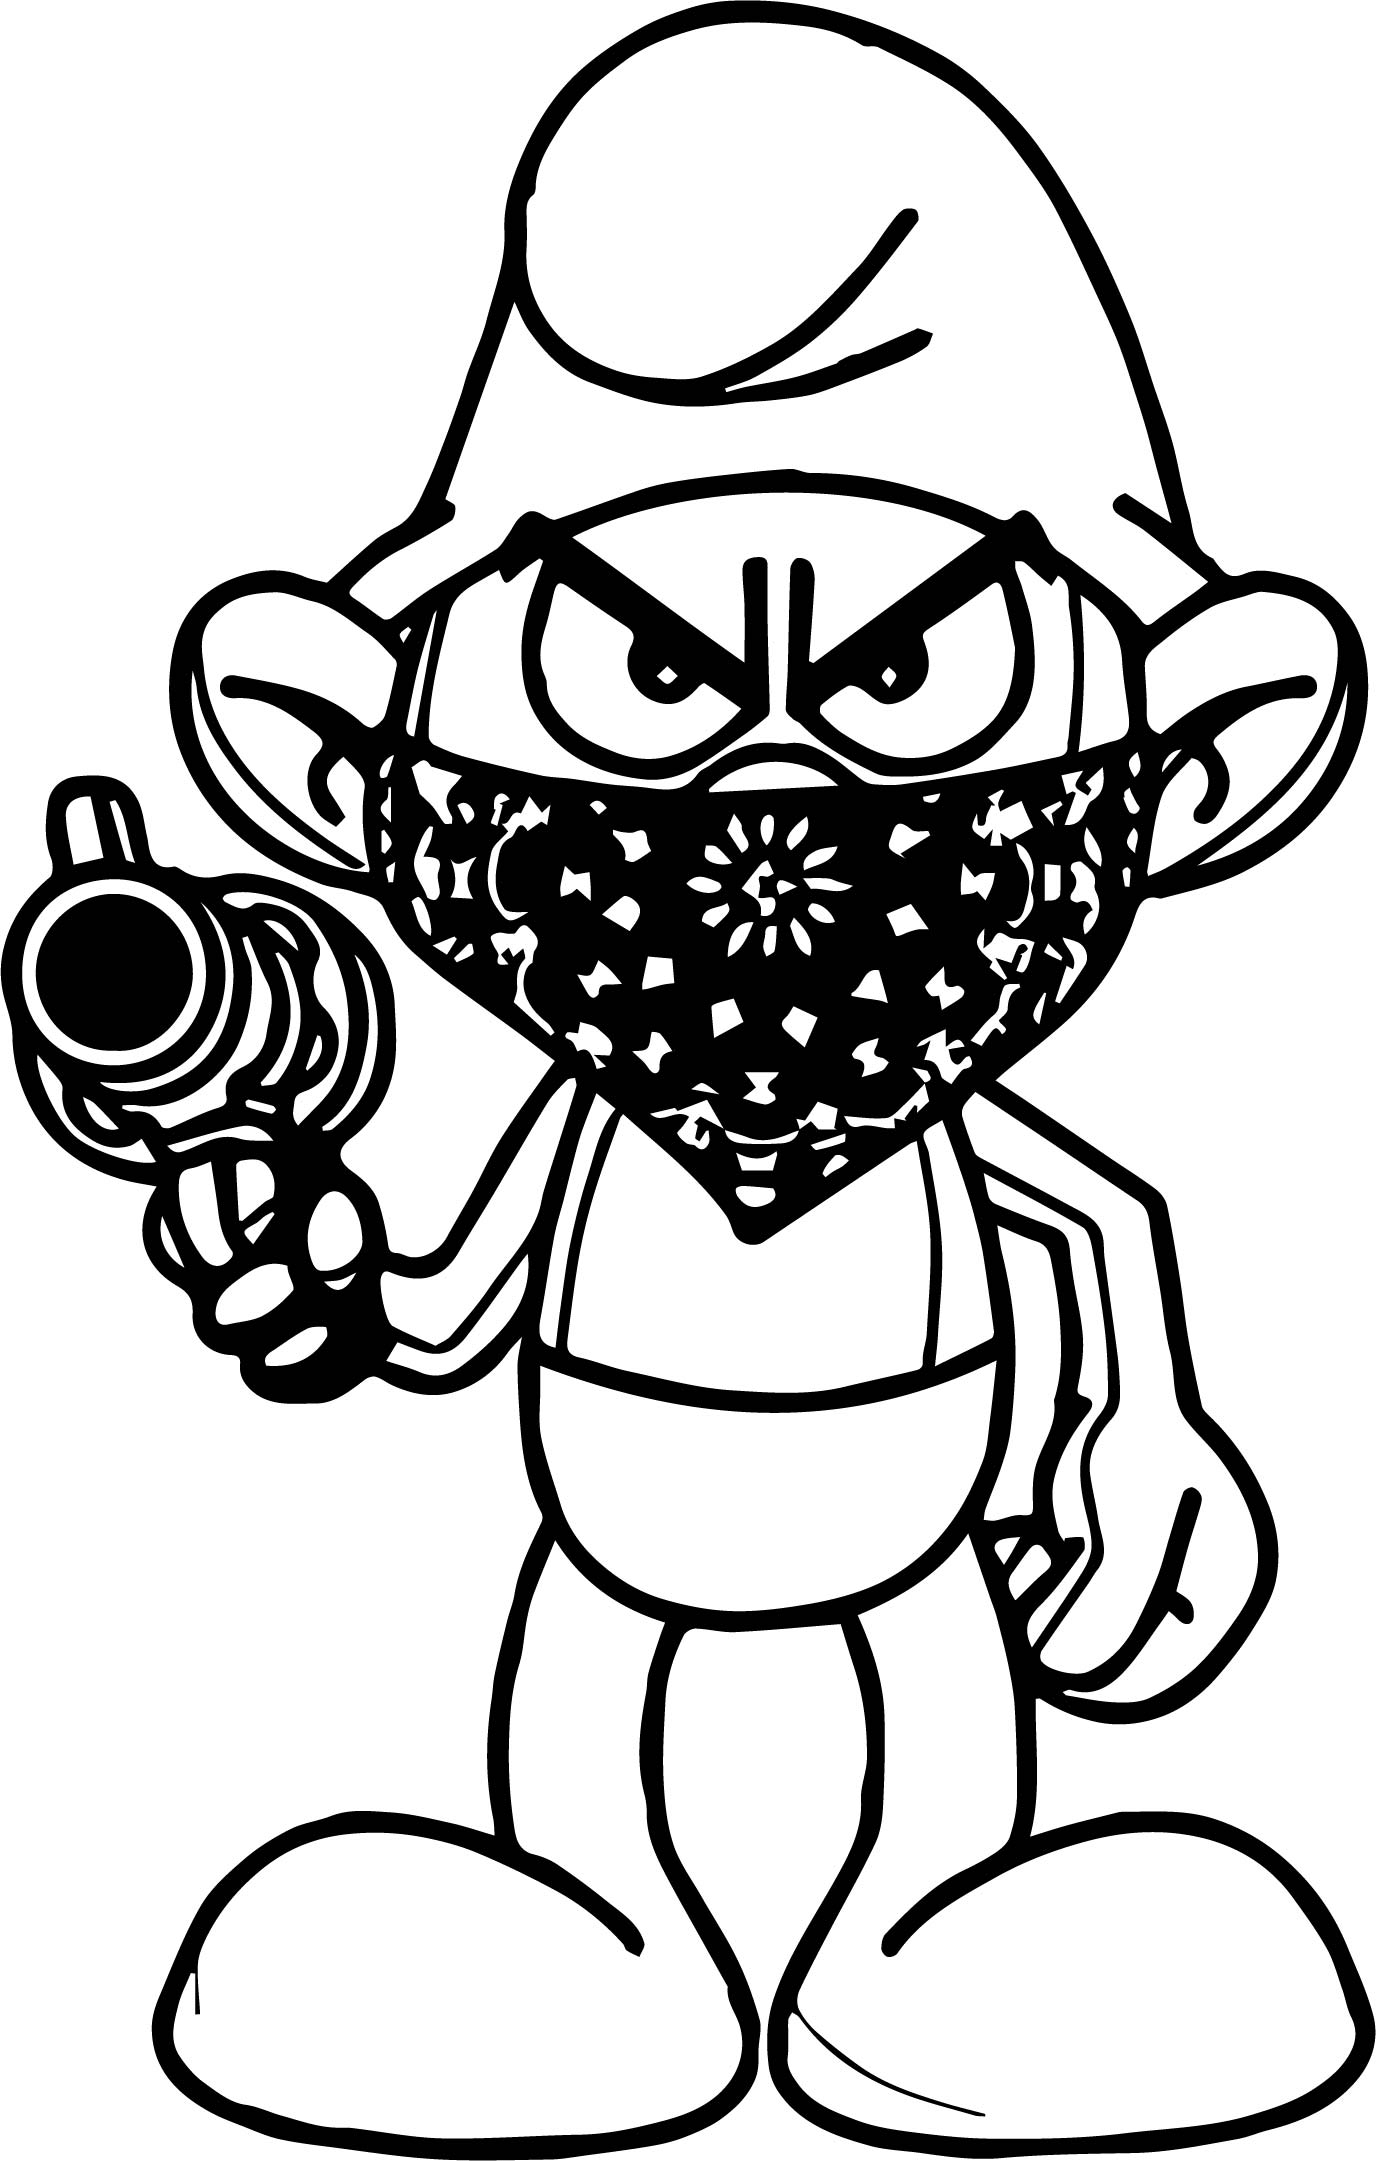 Temp Image Gangsta Smurf Coloring Page Wecoloringpage Com